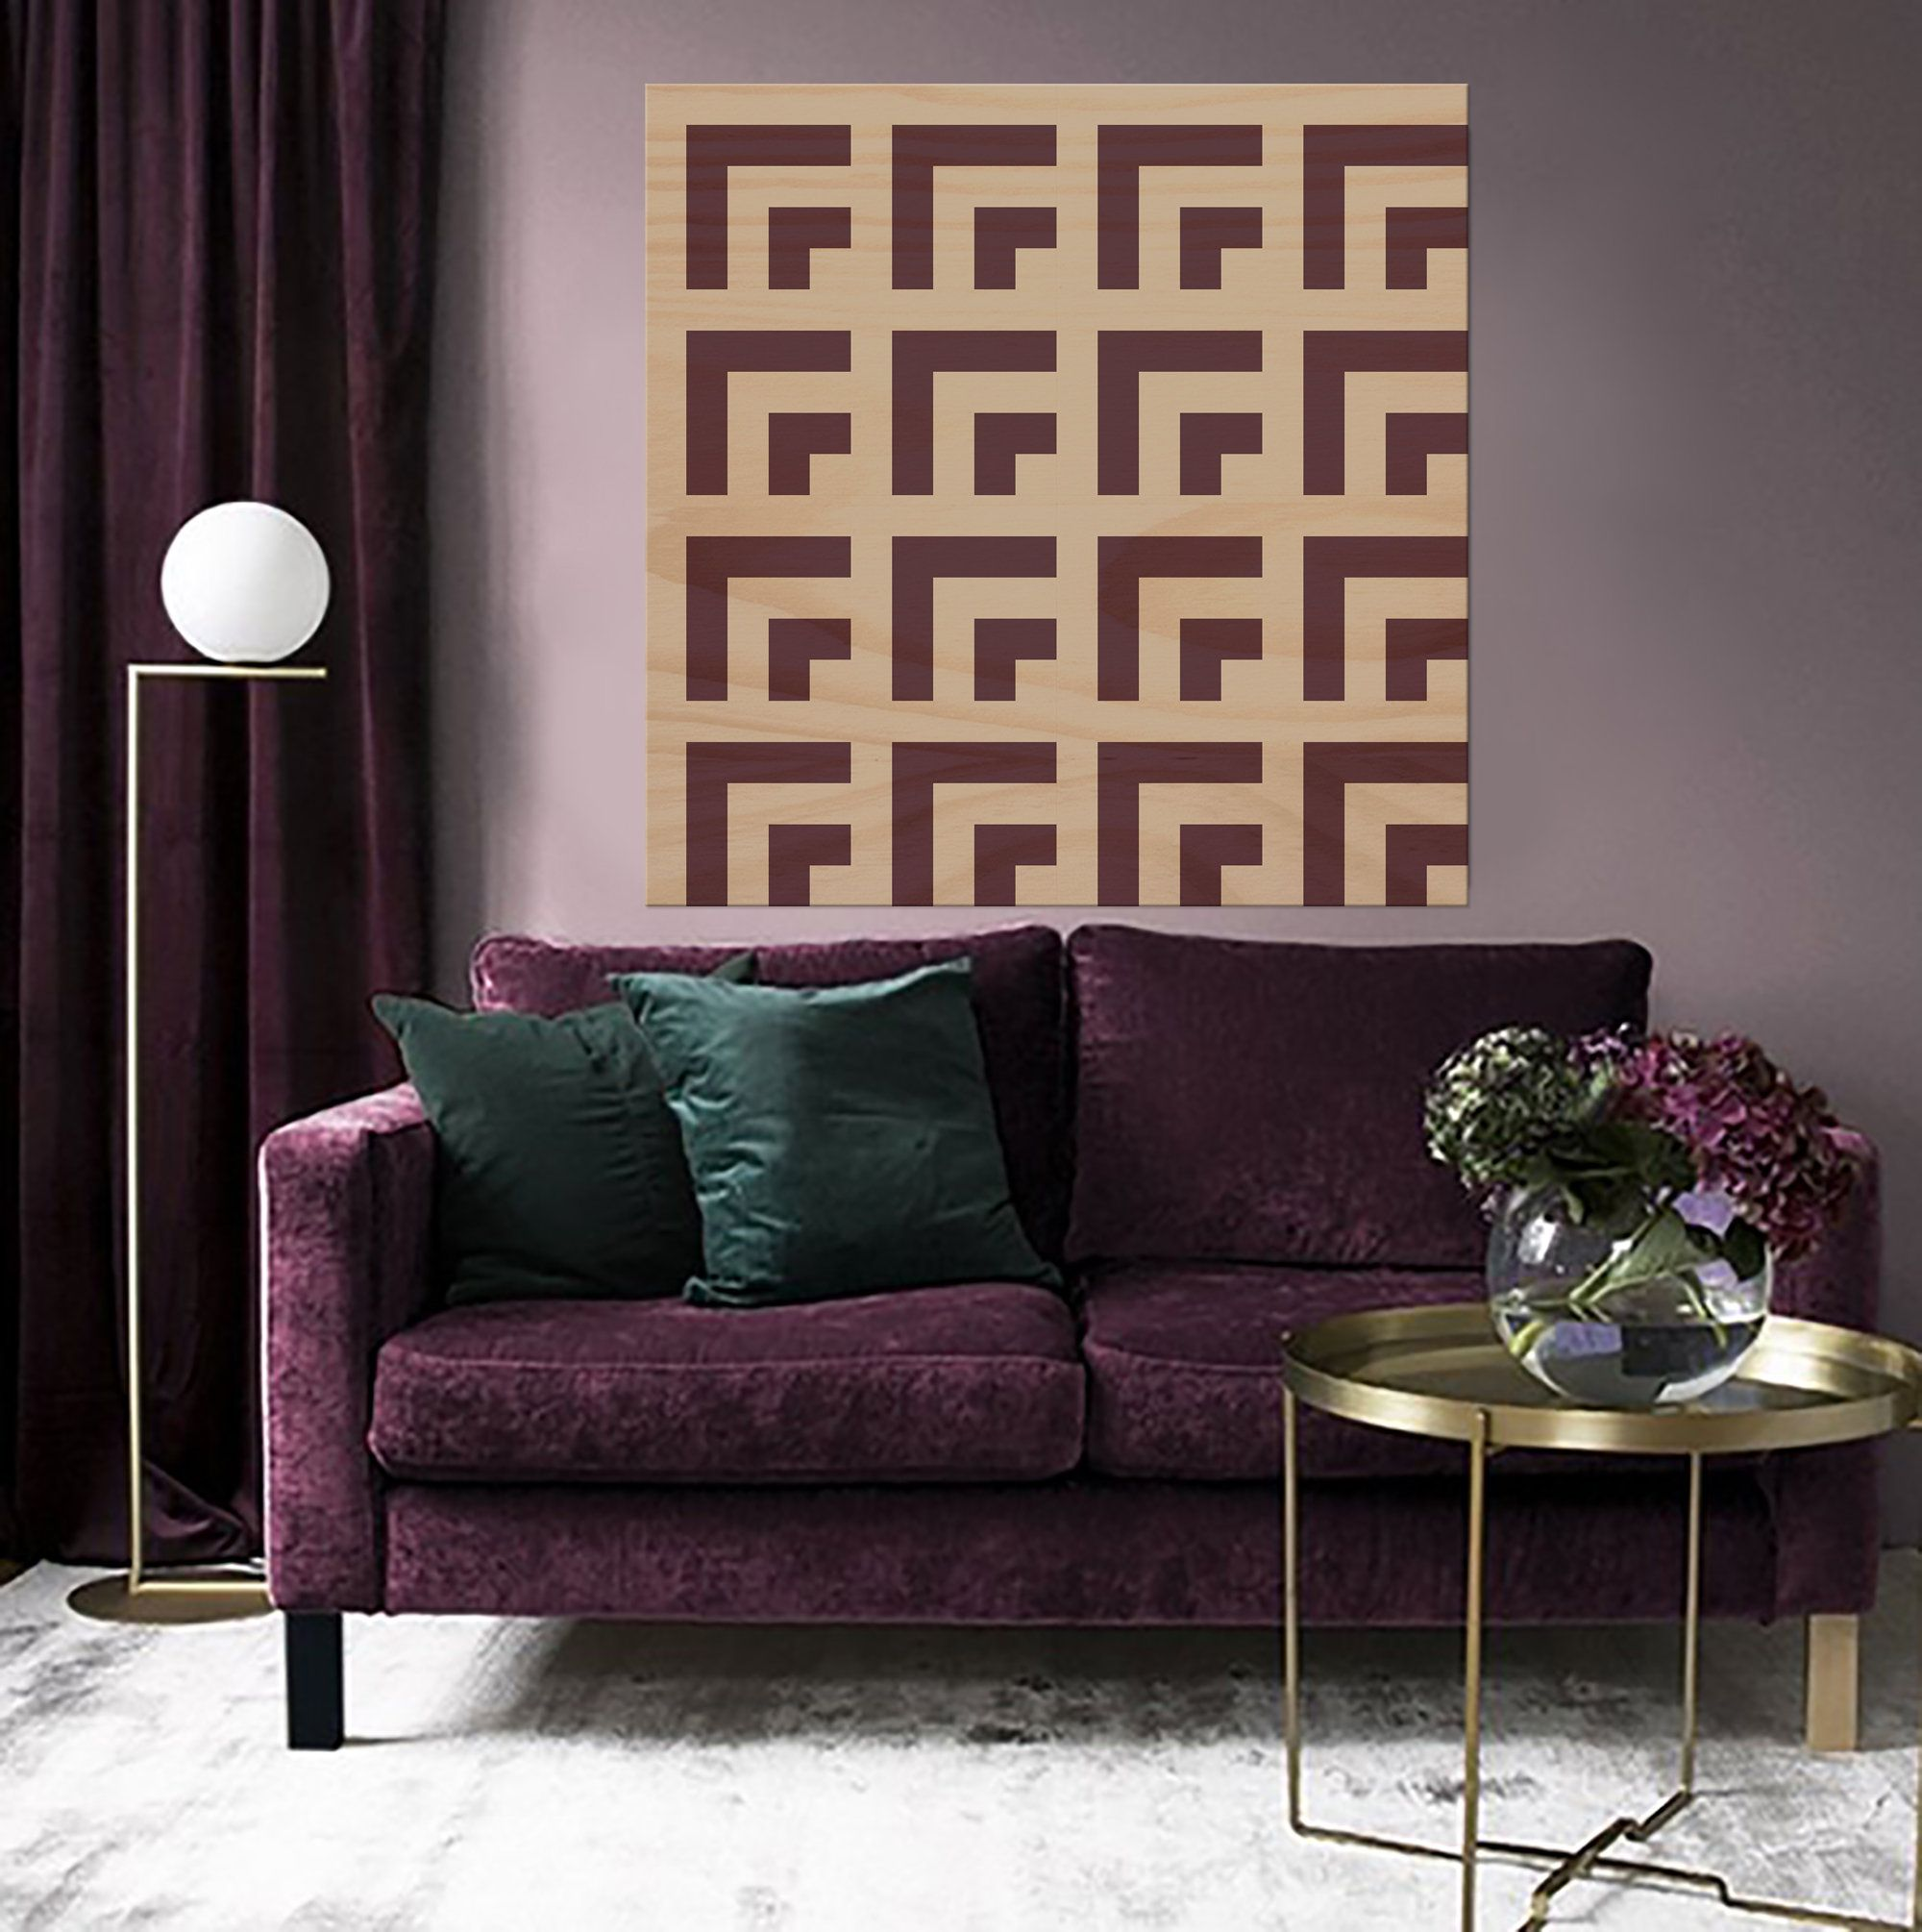 Abstract geometric wall art panel plywood wall art panel